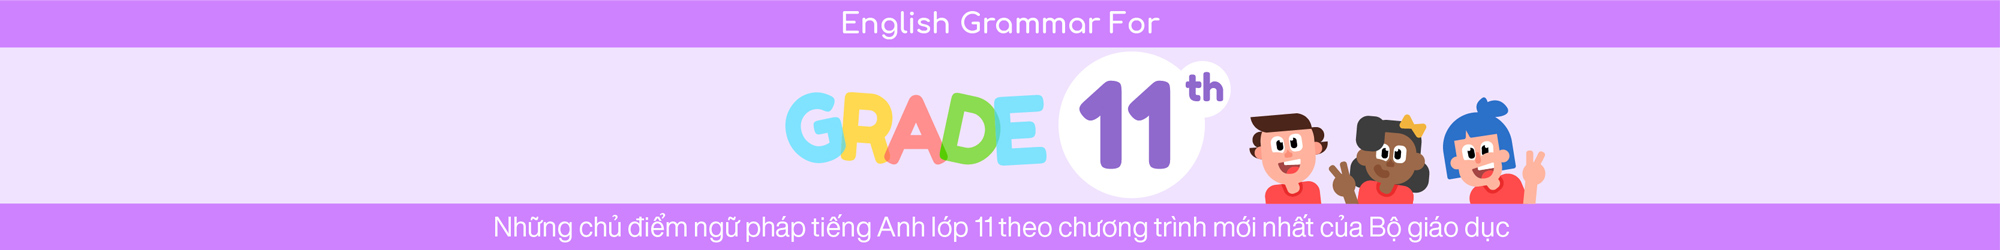 ENGLISH GRAMMAR FOR 11TH GRADE banner